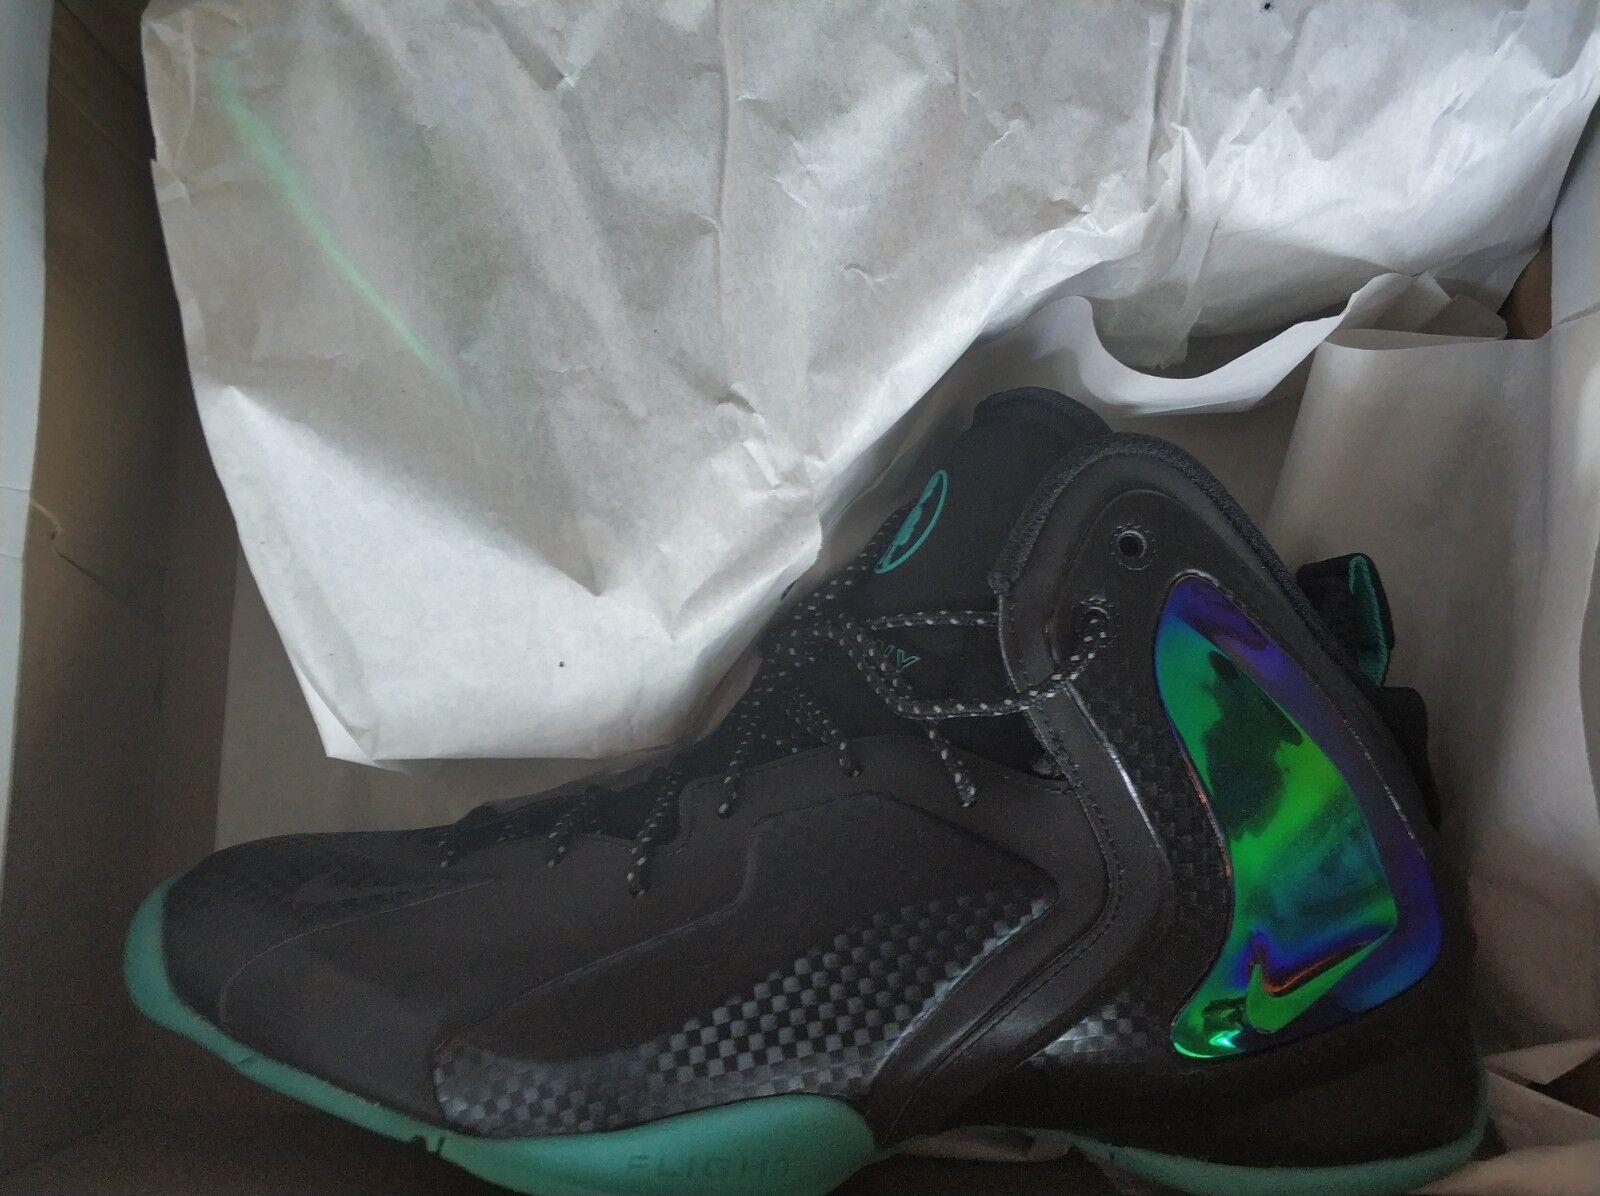 sports shoes a83d5 bf4ff certaines 630999-002 hyper jade nike lil penny nous 12,5 12,5 12,5 hommes  de basket ball 6acfcb